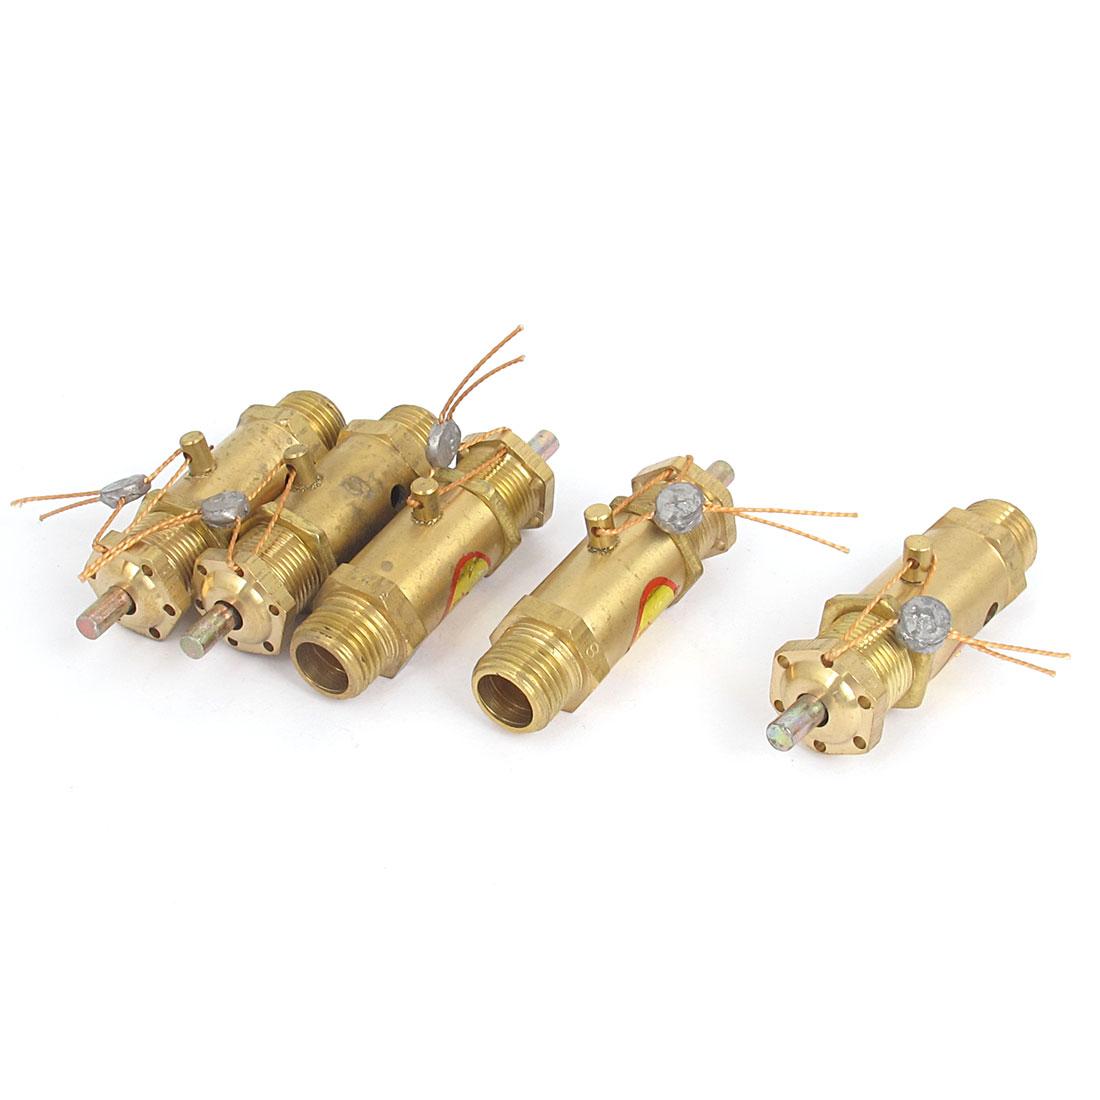 1/4BSP Male Thread Air Compressor Safety Pressure Relief Valve Gold Tone 5pcs